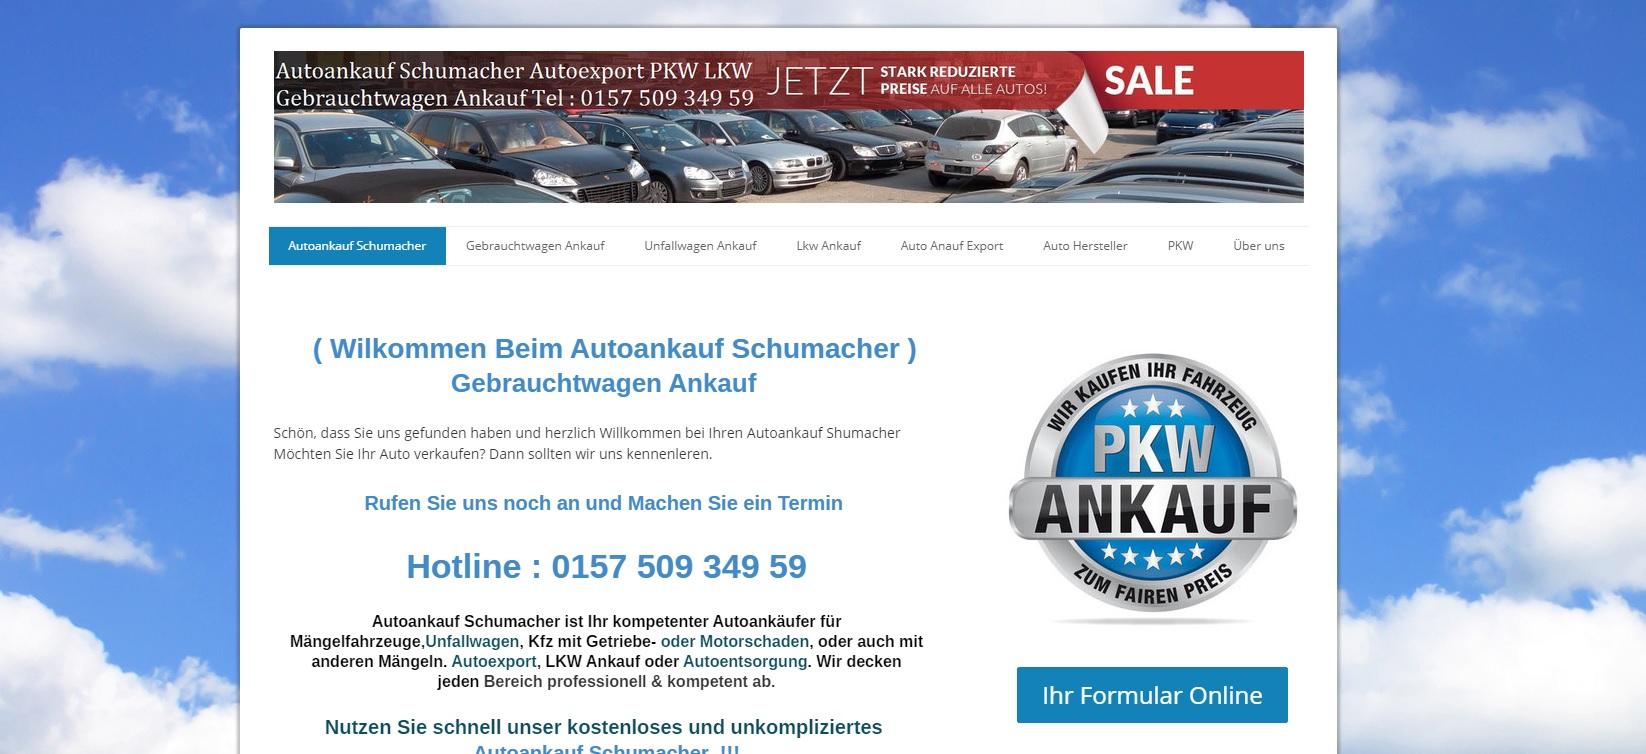 autoankauf-schumacher.de - Autoankauf Freiburg im Breisgau